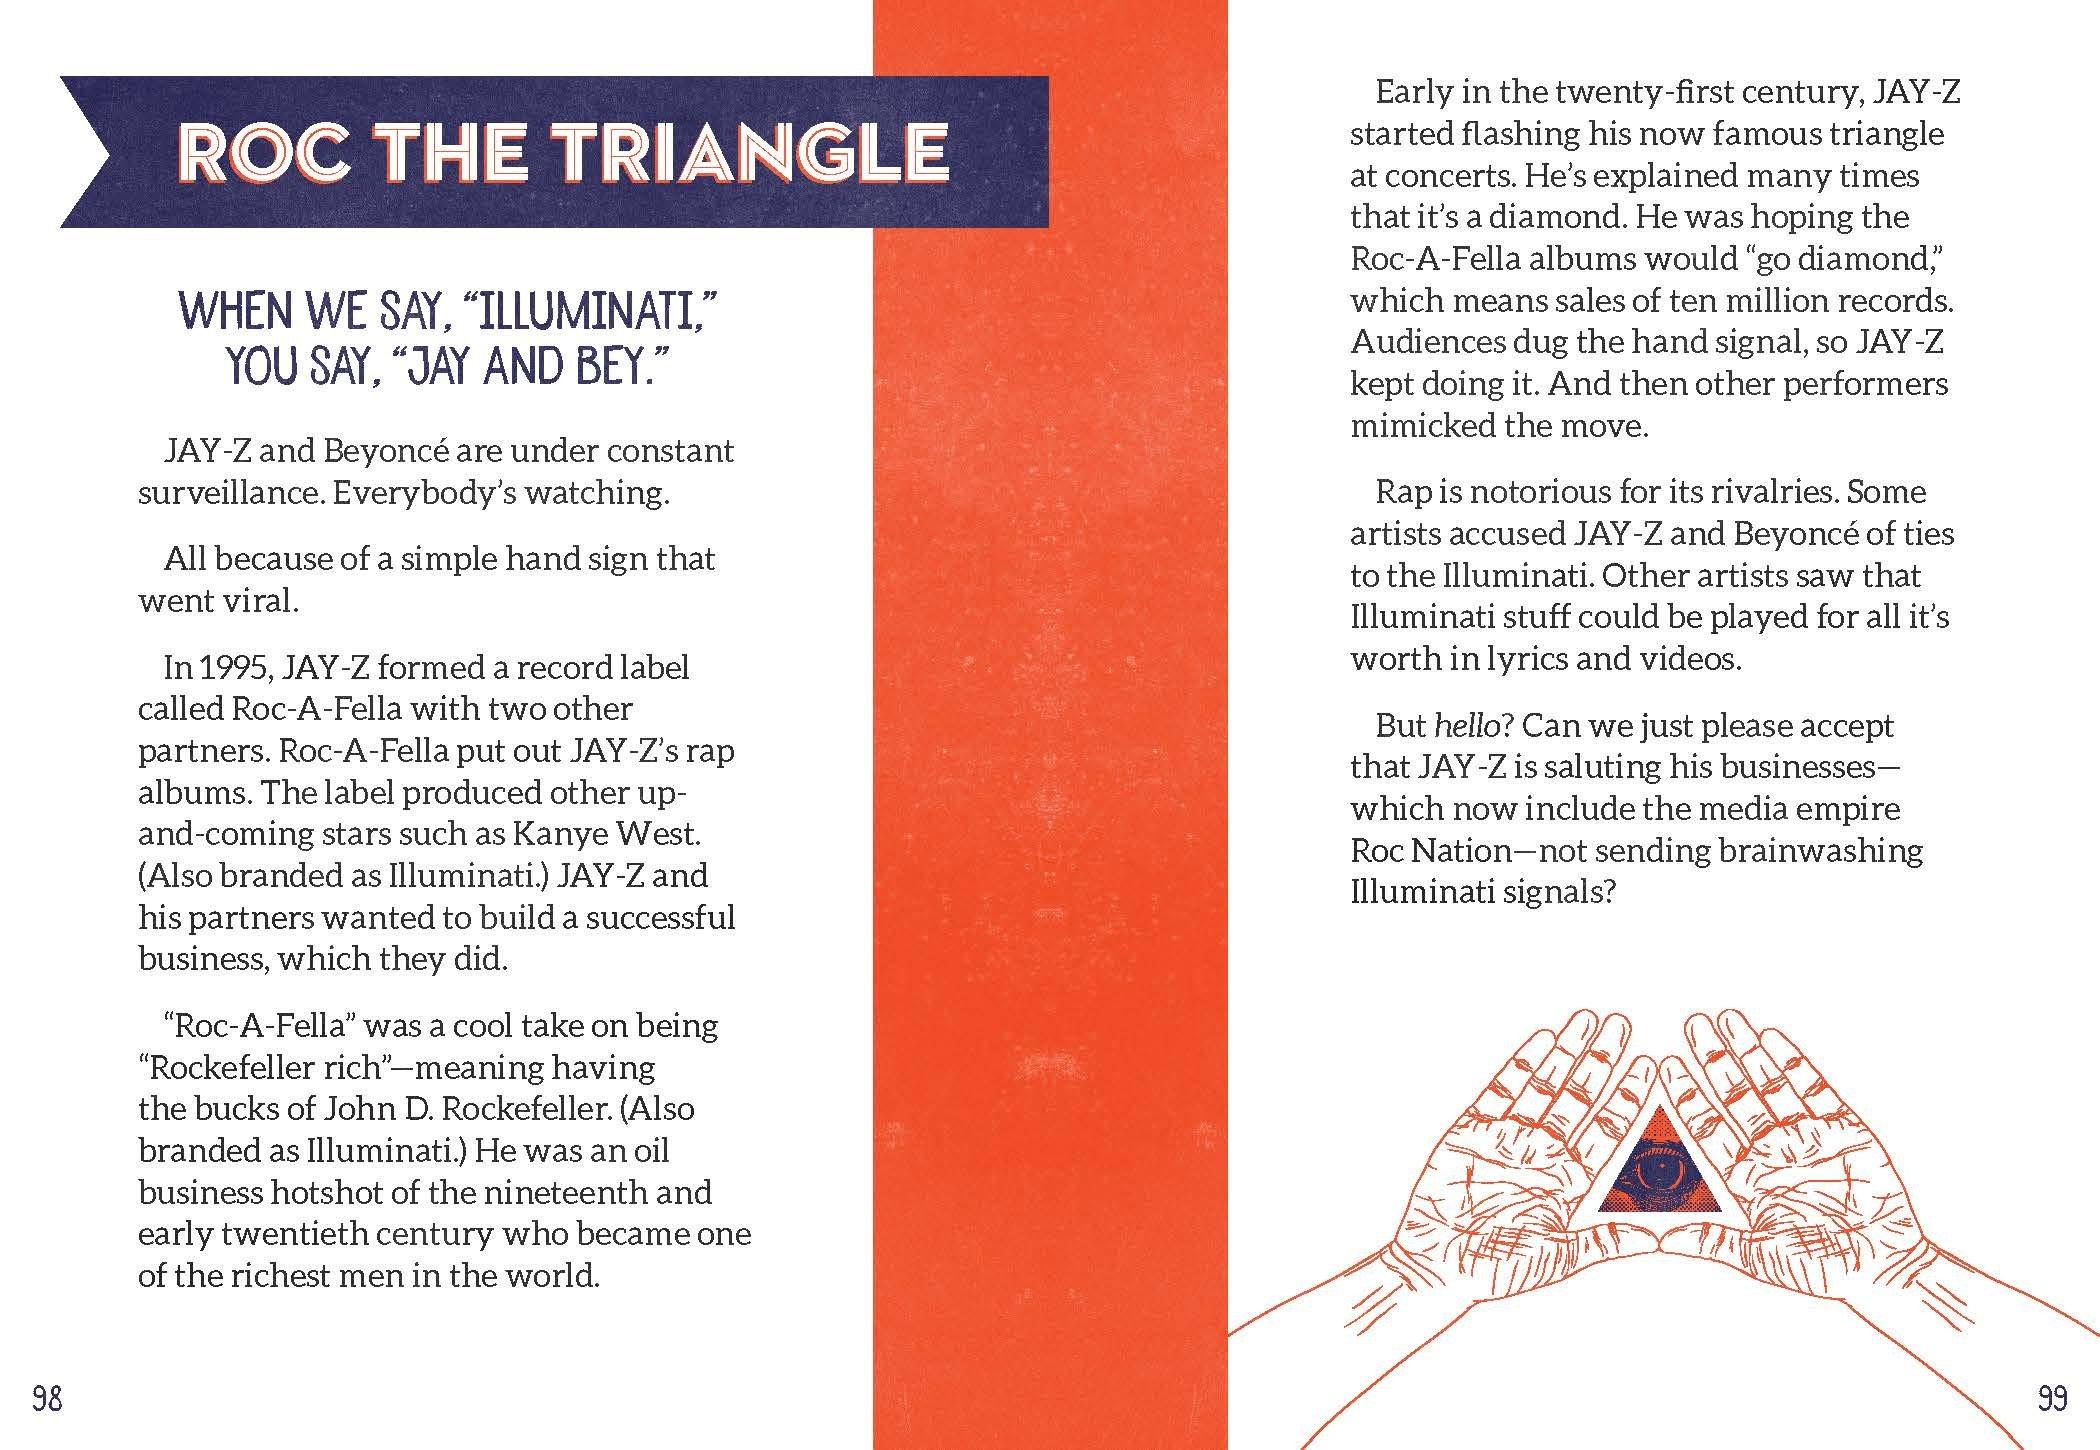 I Spy The Illuminati Eye Whats The Big Secret Sheila Keenan